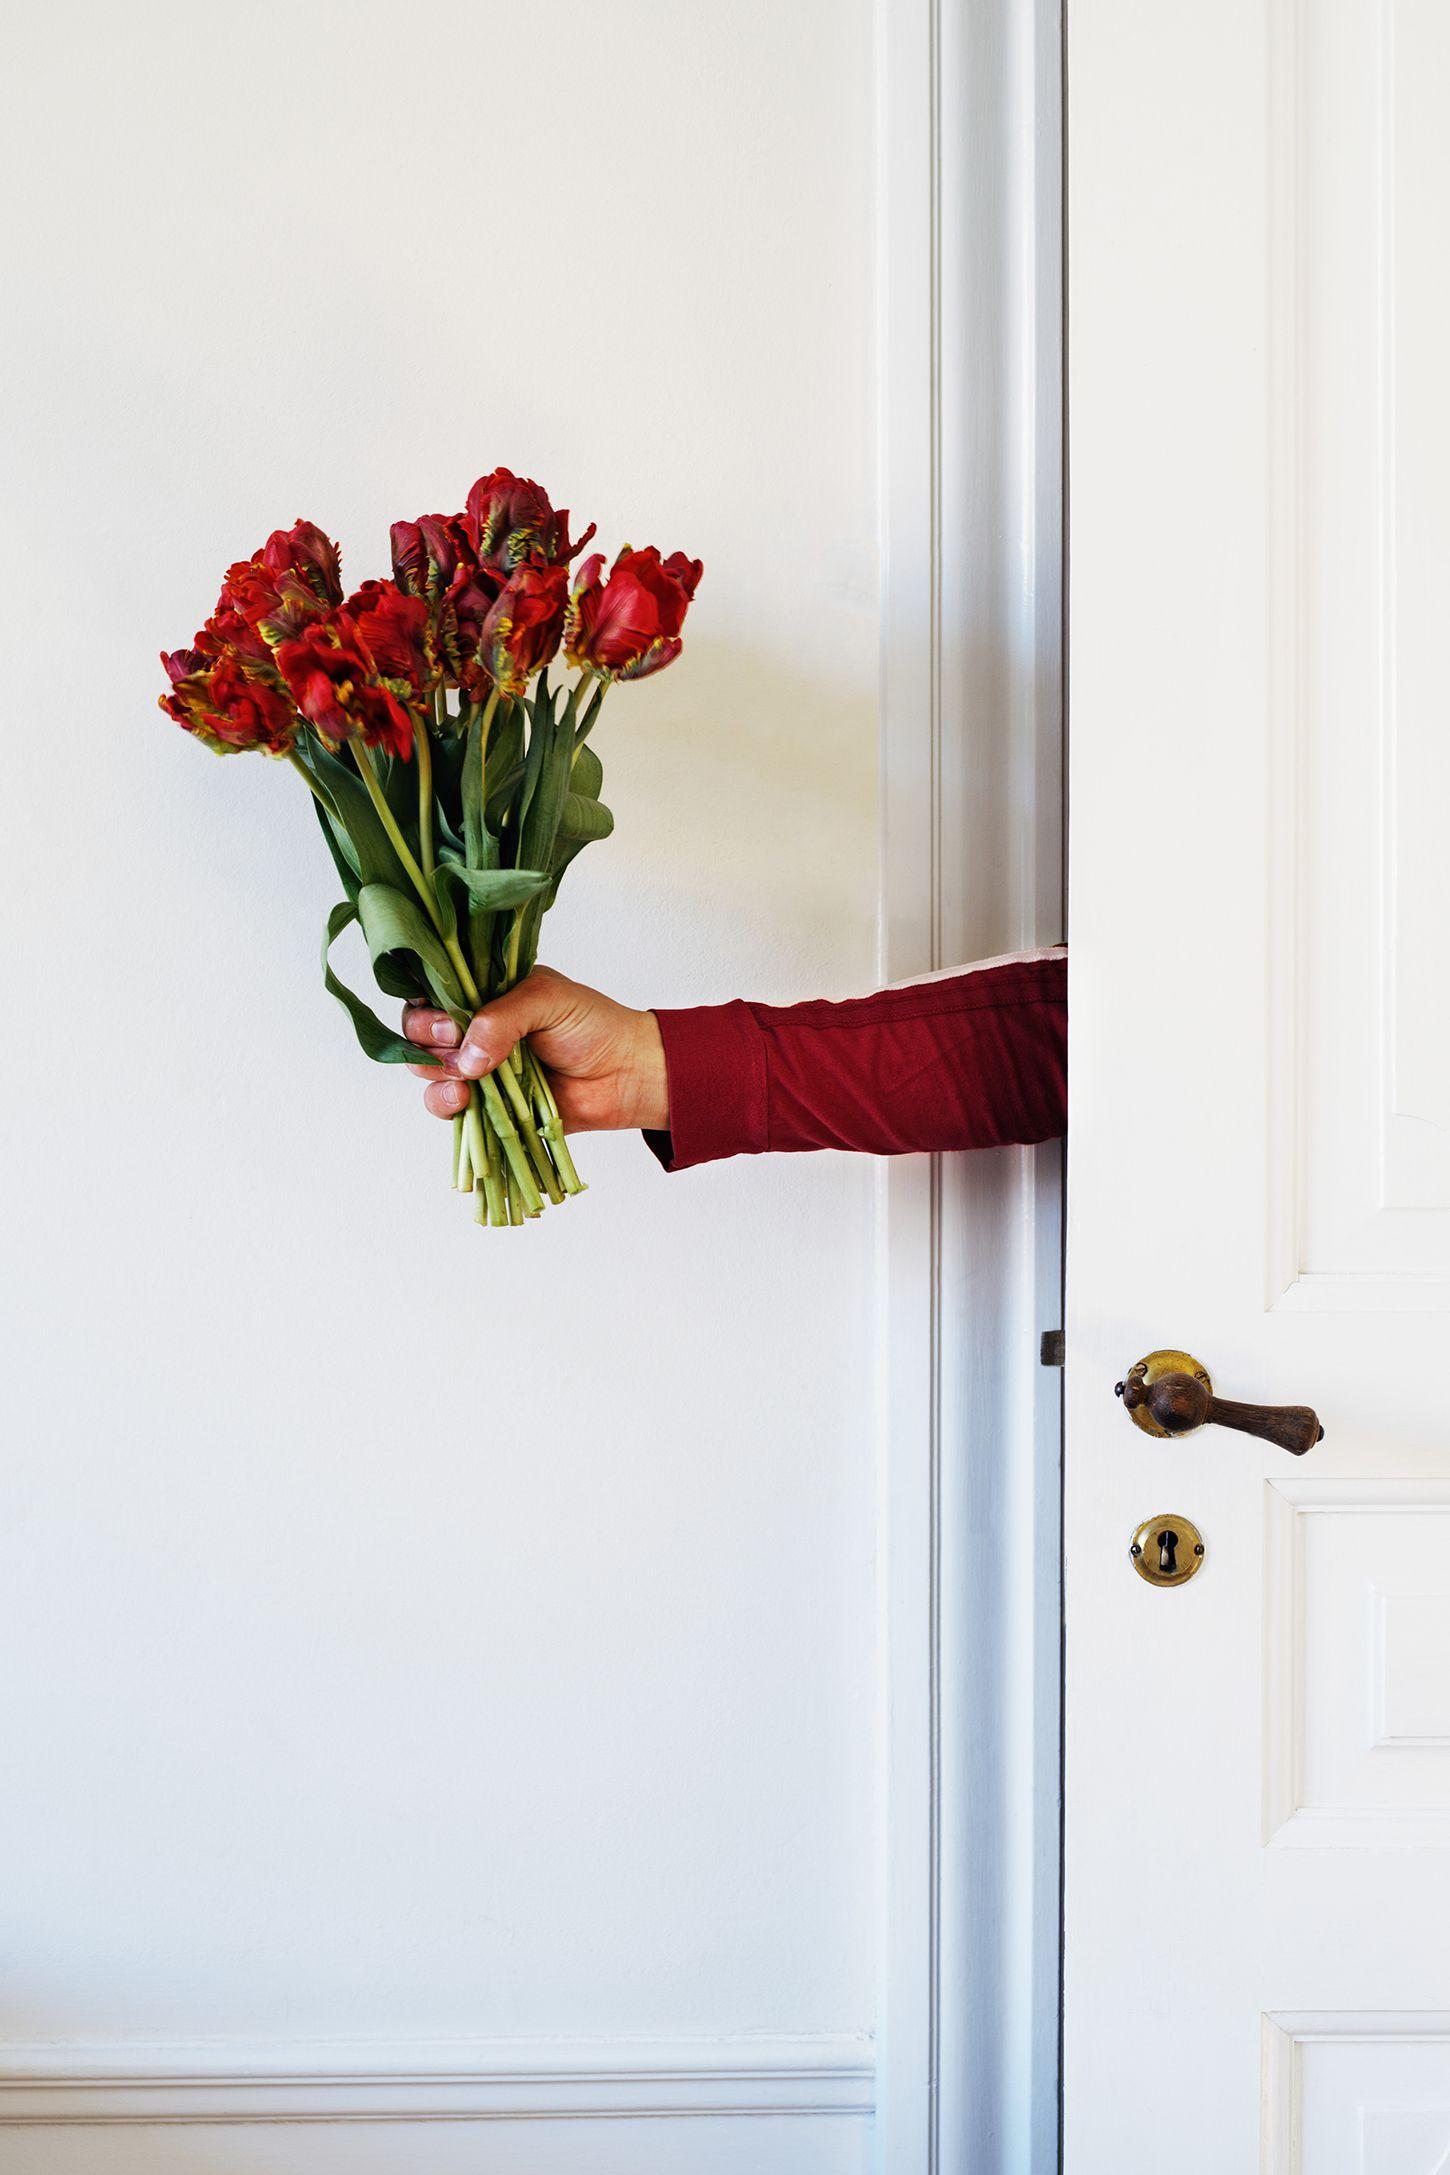 20 Fun Date Night Ideas - Cute and Romantic Dates